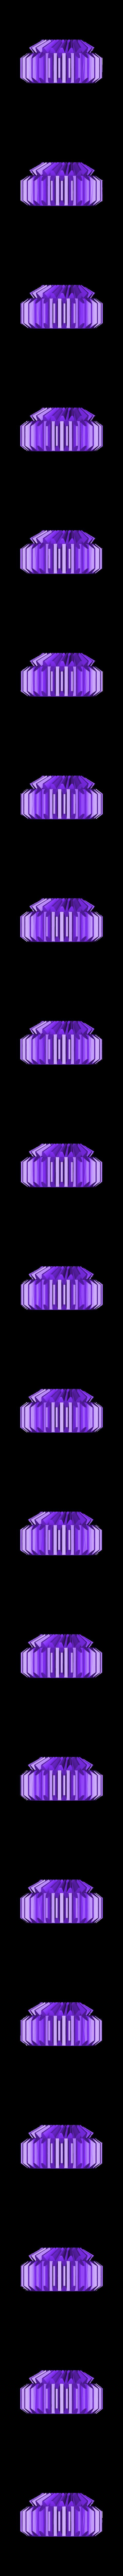 Bubble_drive_gear_C.stl Download free STL file Bubbles! • 3D printer object, Zippityboomba